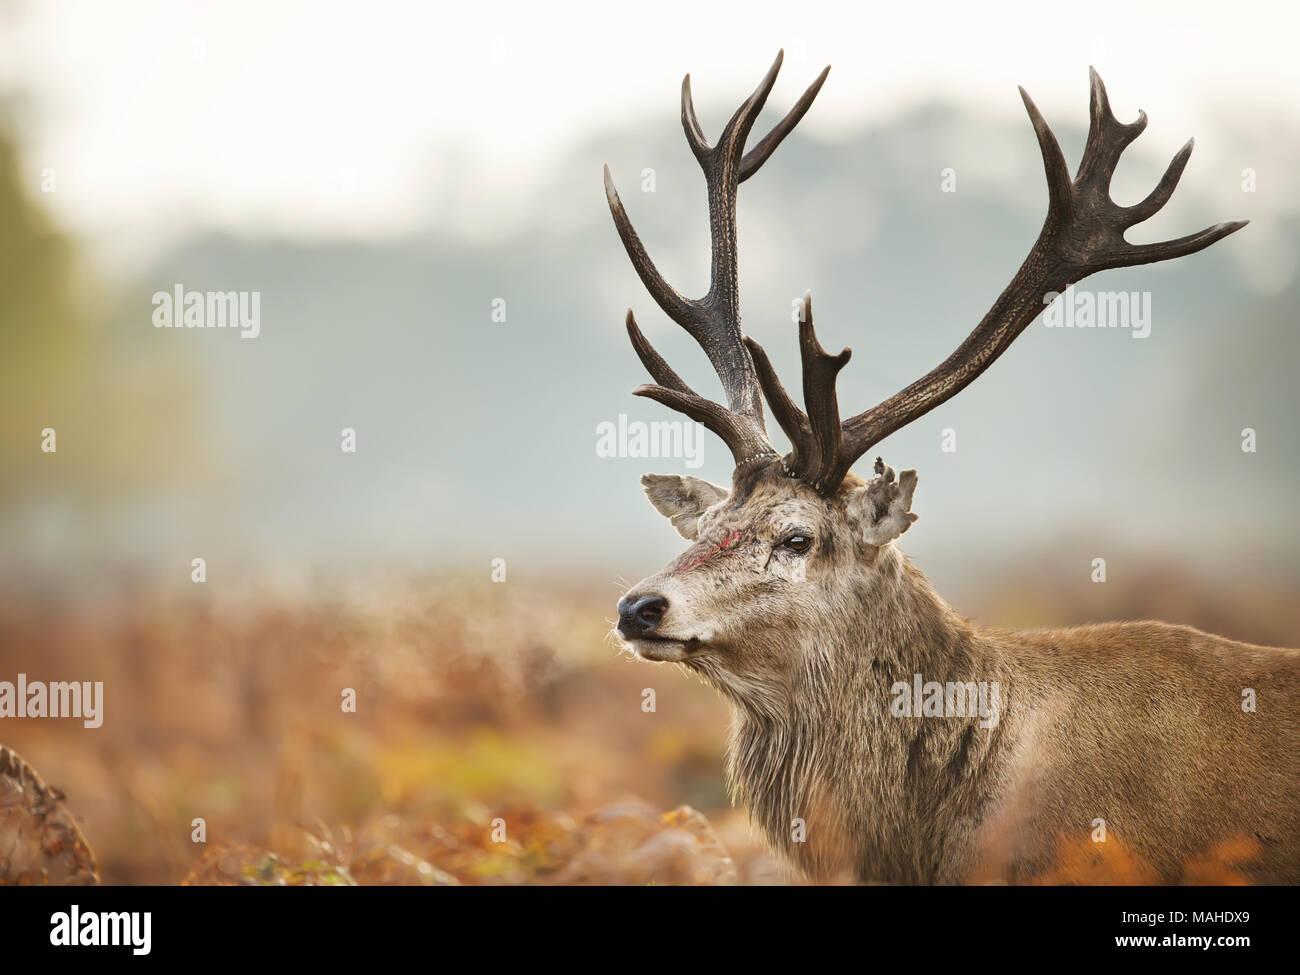 Close-up of an injured Red deer during the rutting season, UK. - Stock Image